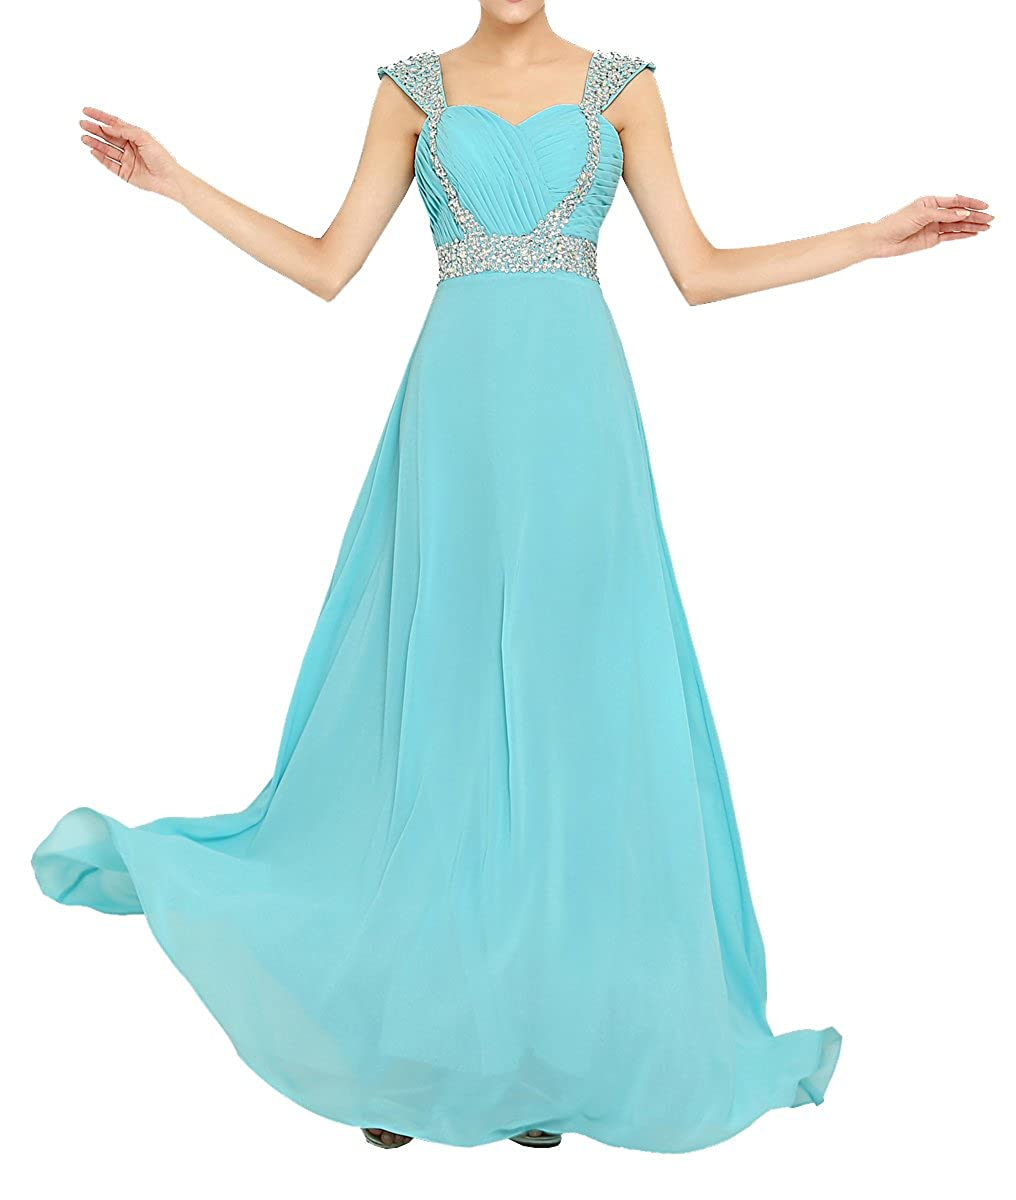 Butterfly Paradise Dress Bridesmaid Dresses Plus Size